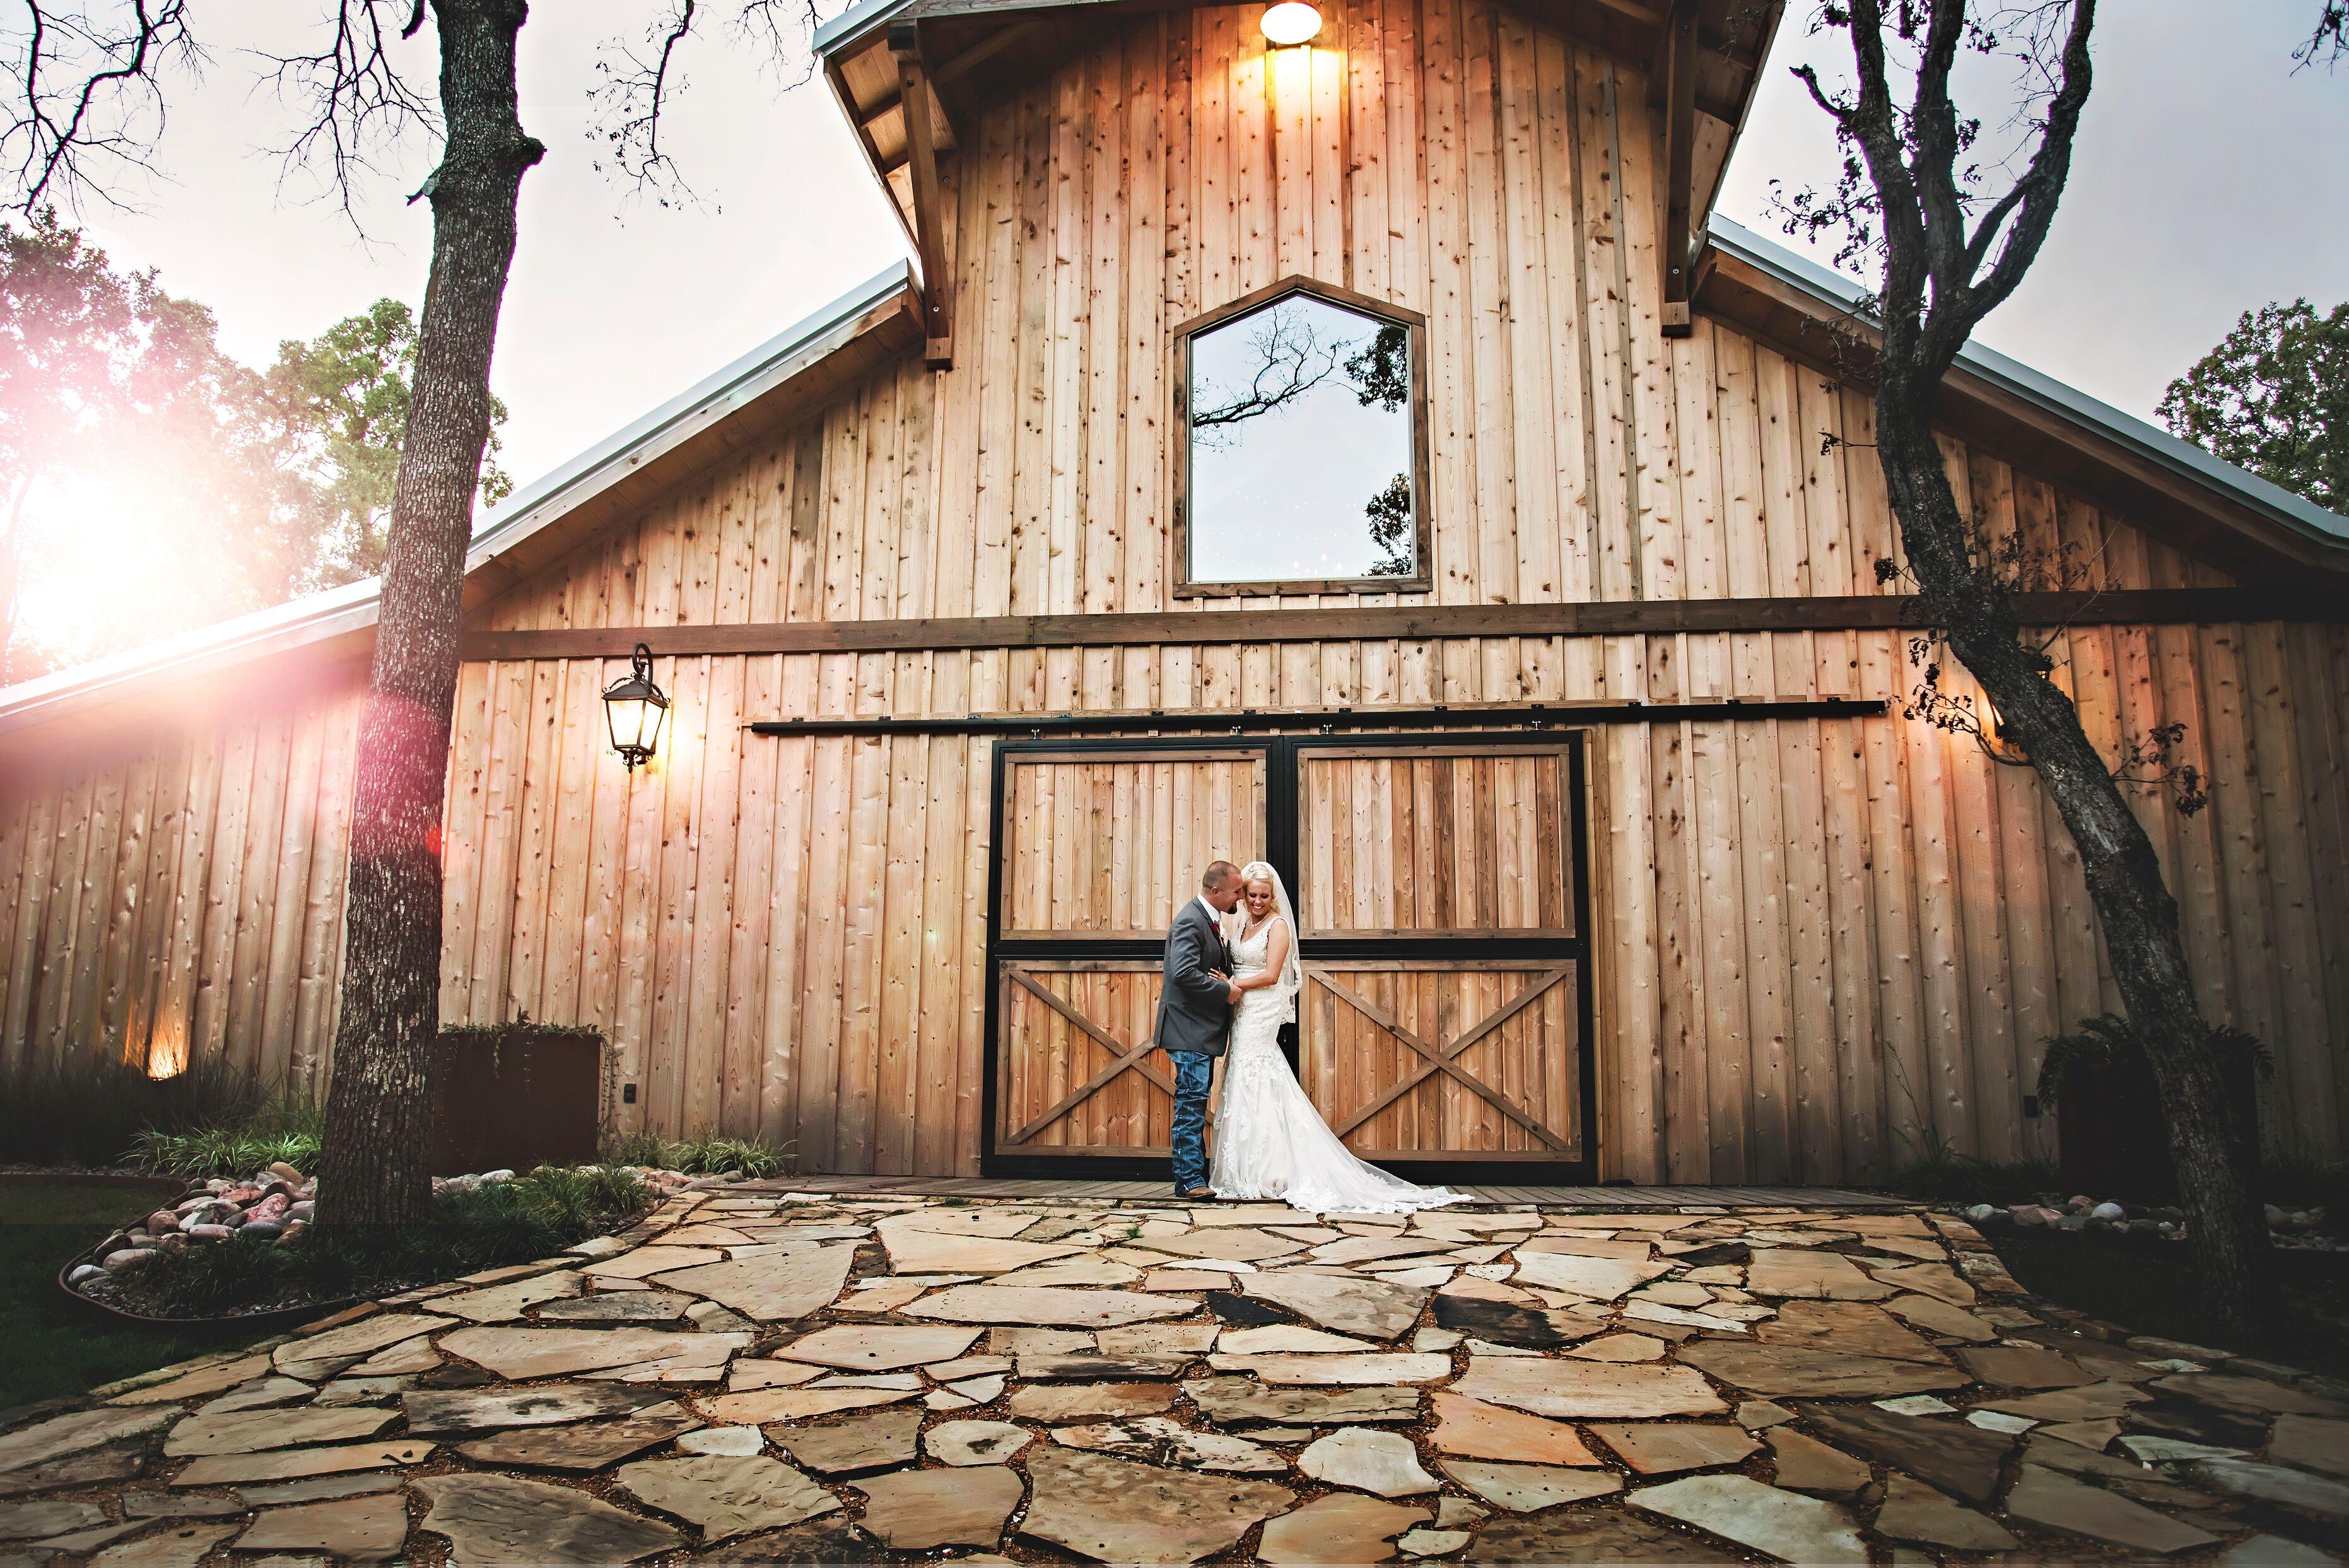 Valley view wedding